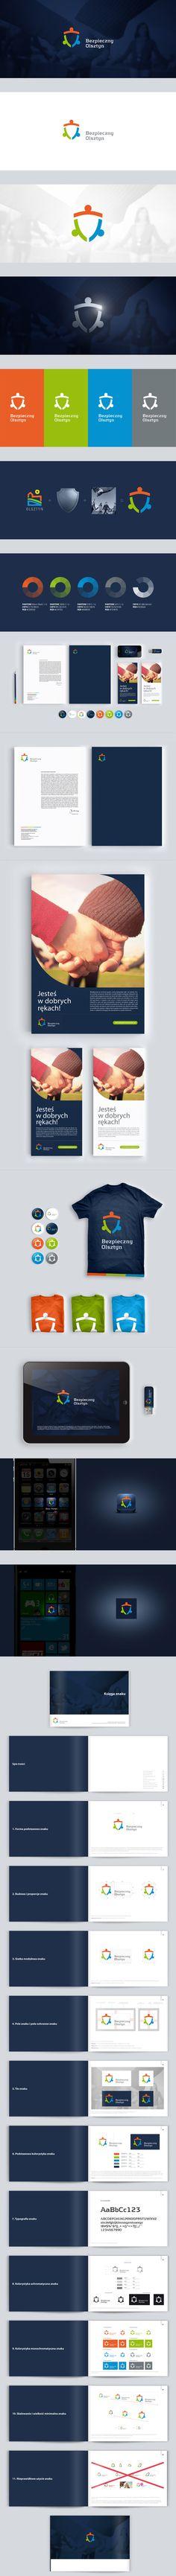 design behance logo